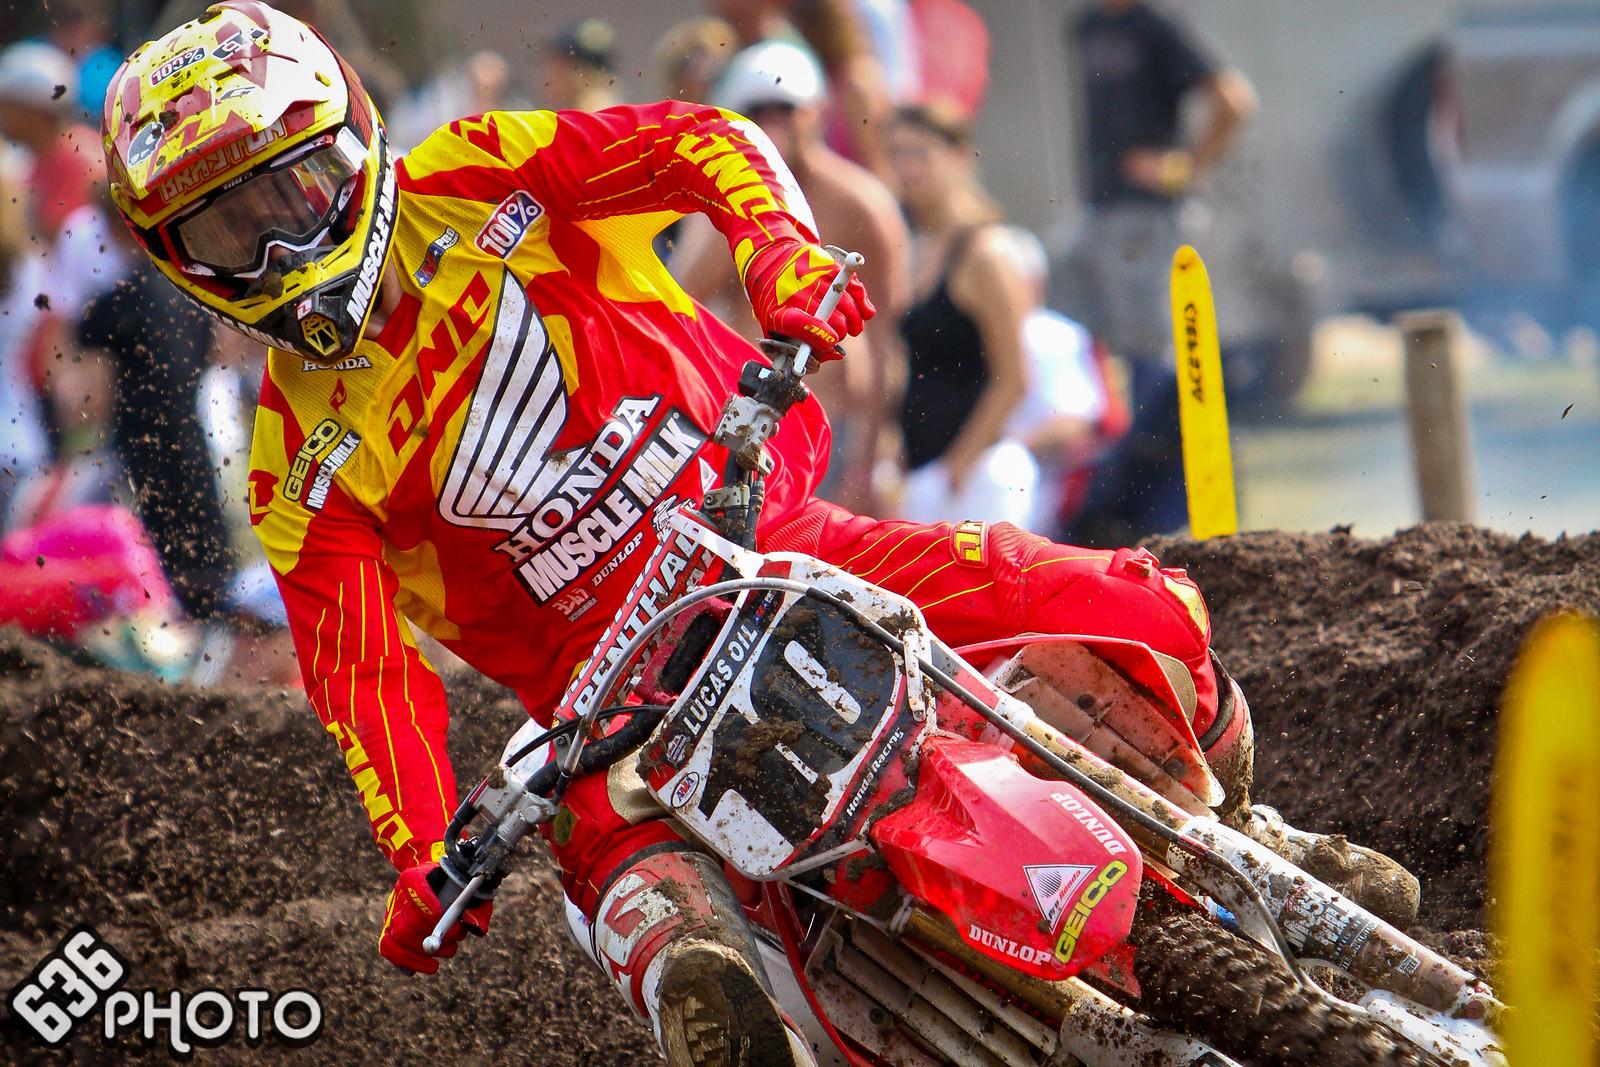 IMG 3183 - 636photo - Motocross Pictures - Vital MX